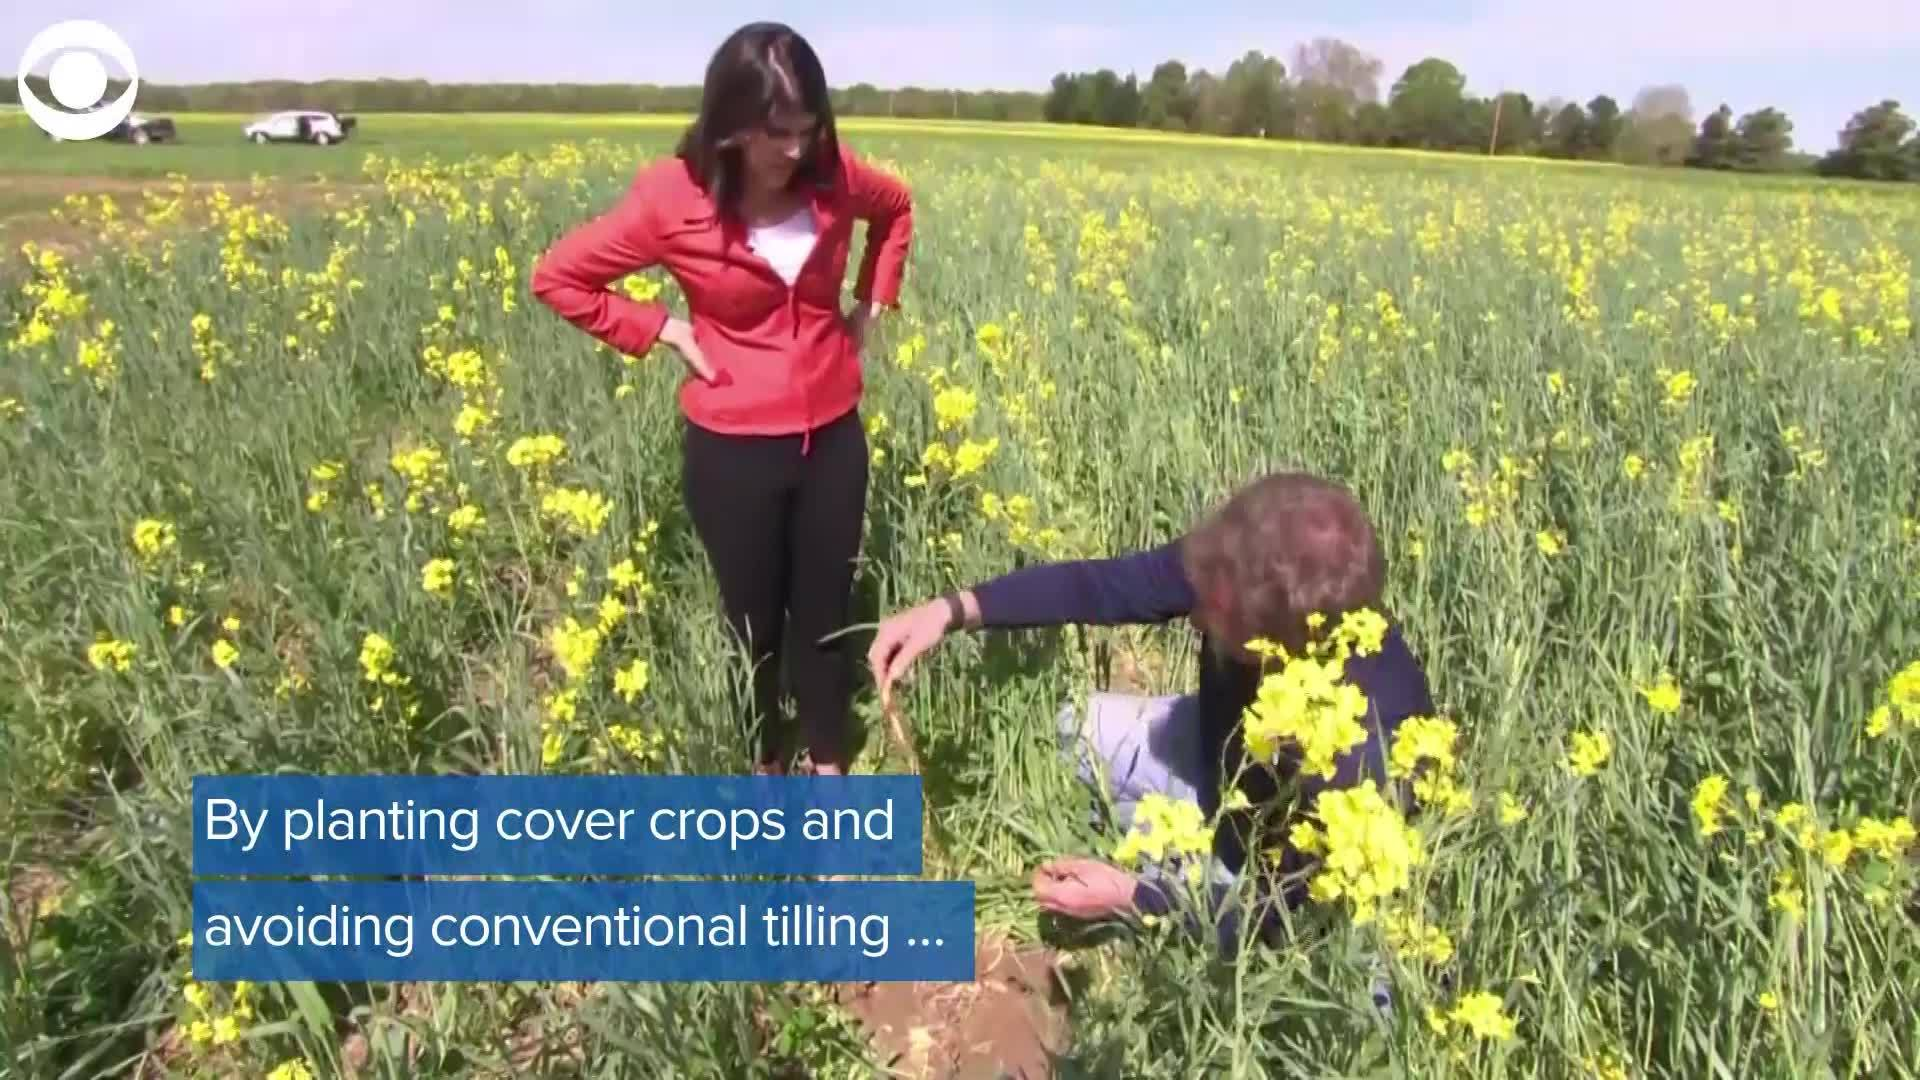 WEB_EXTRA_Climate_Smart_Farming_0_20190507152748